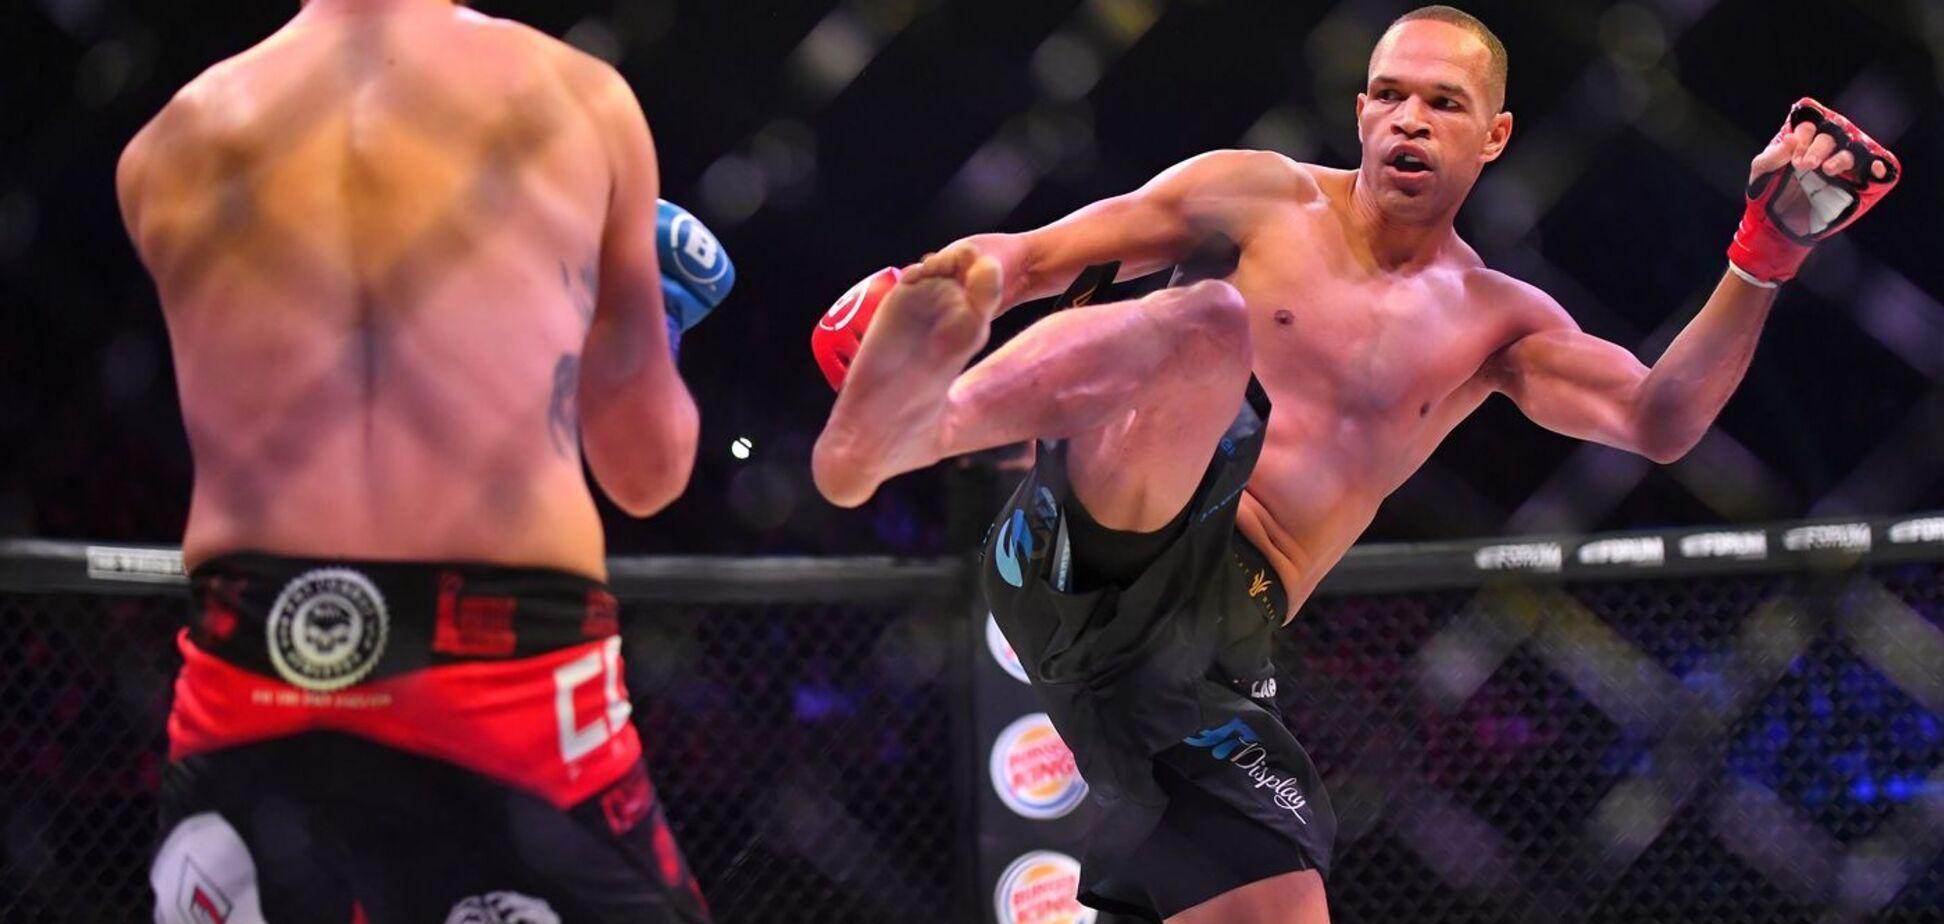 Реймонд Дэниелс. Источник: MMA Boxing